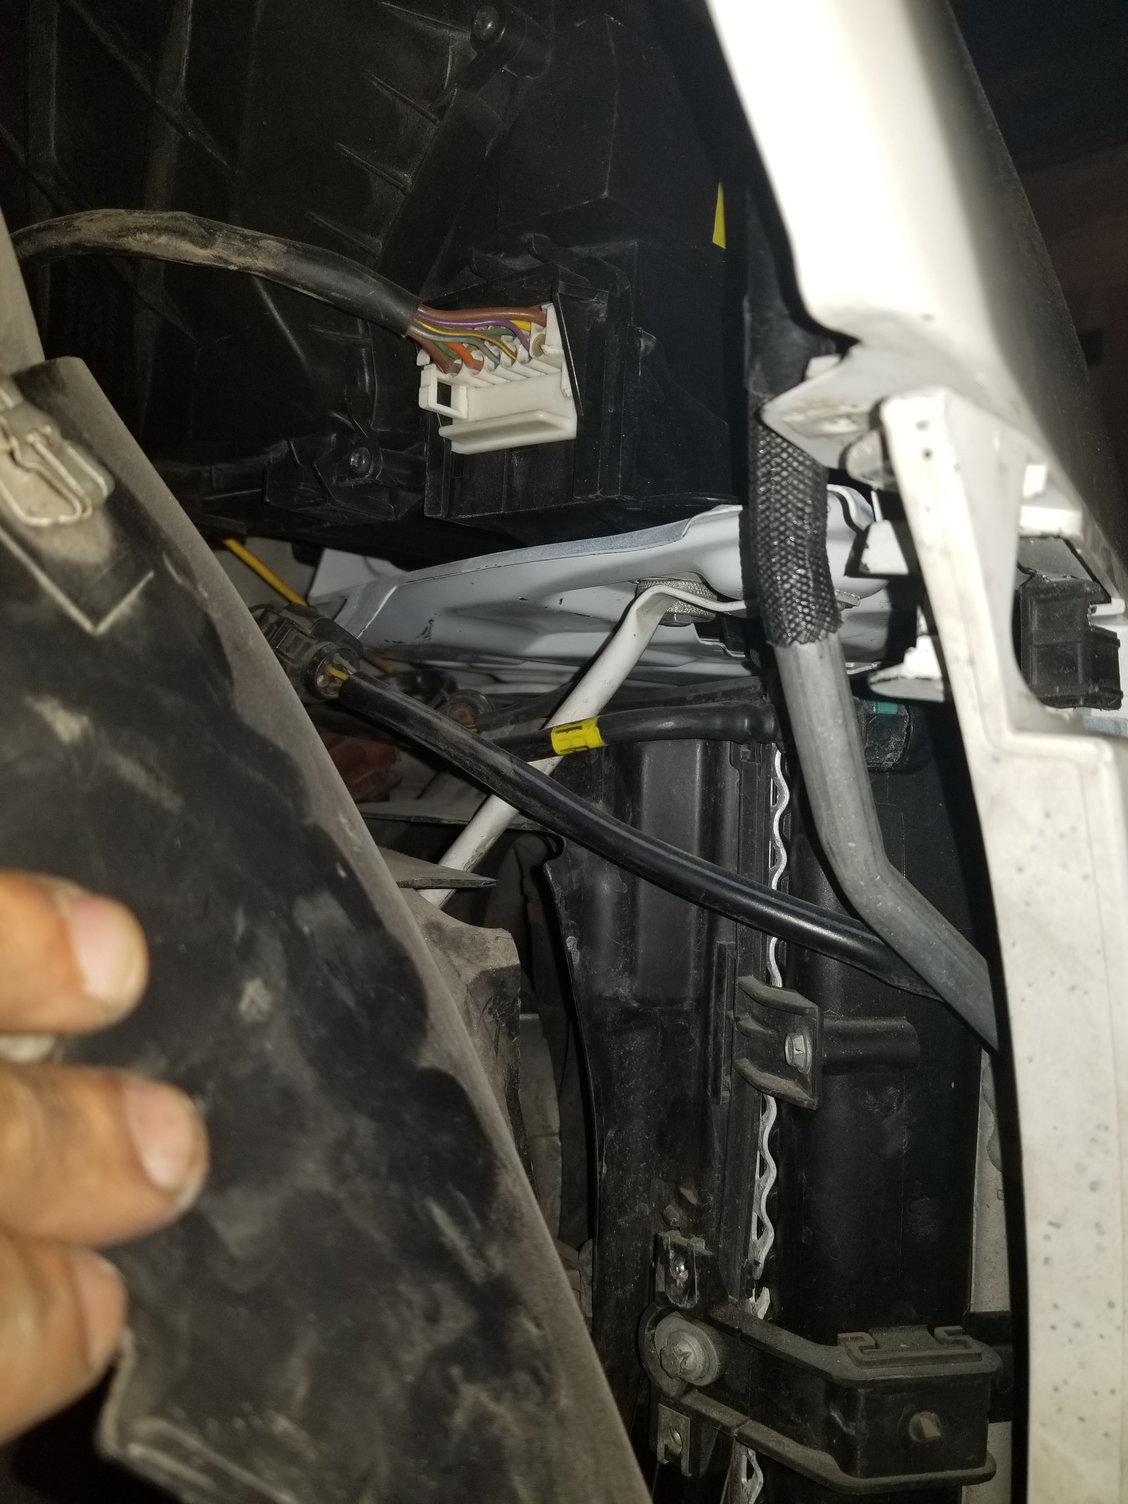 997 2 Side Marker Light Wiring Help Needed